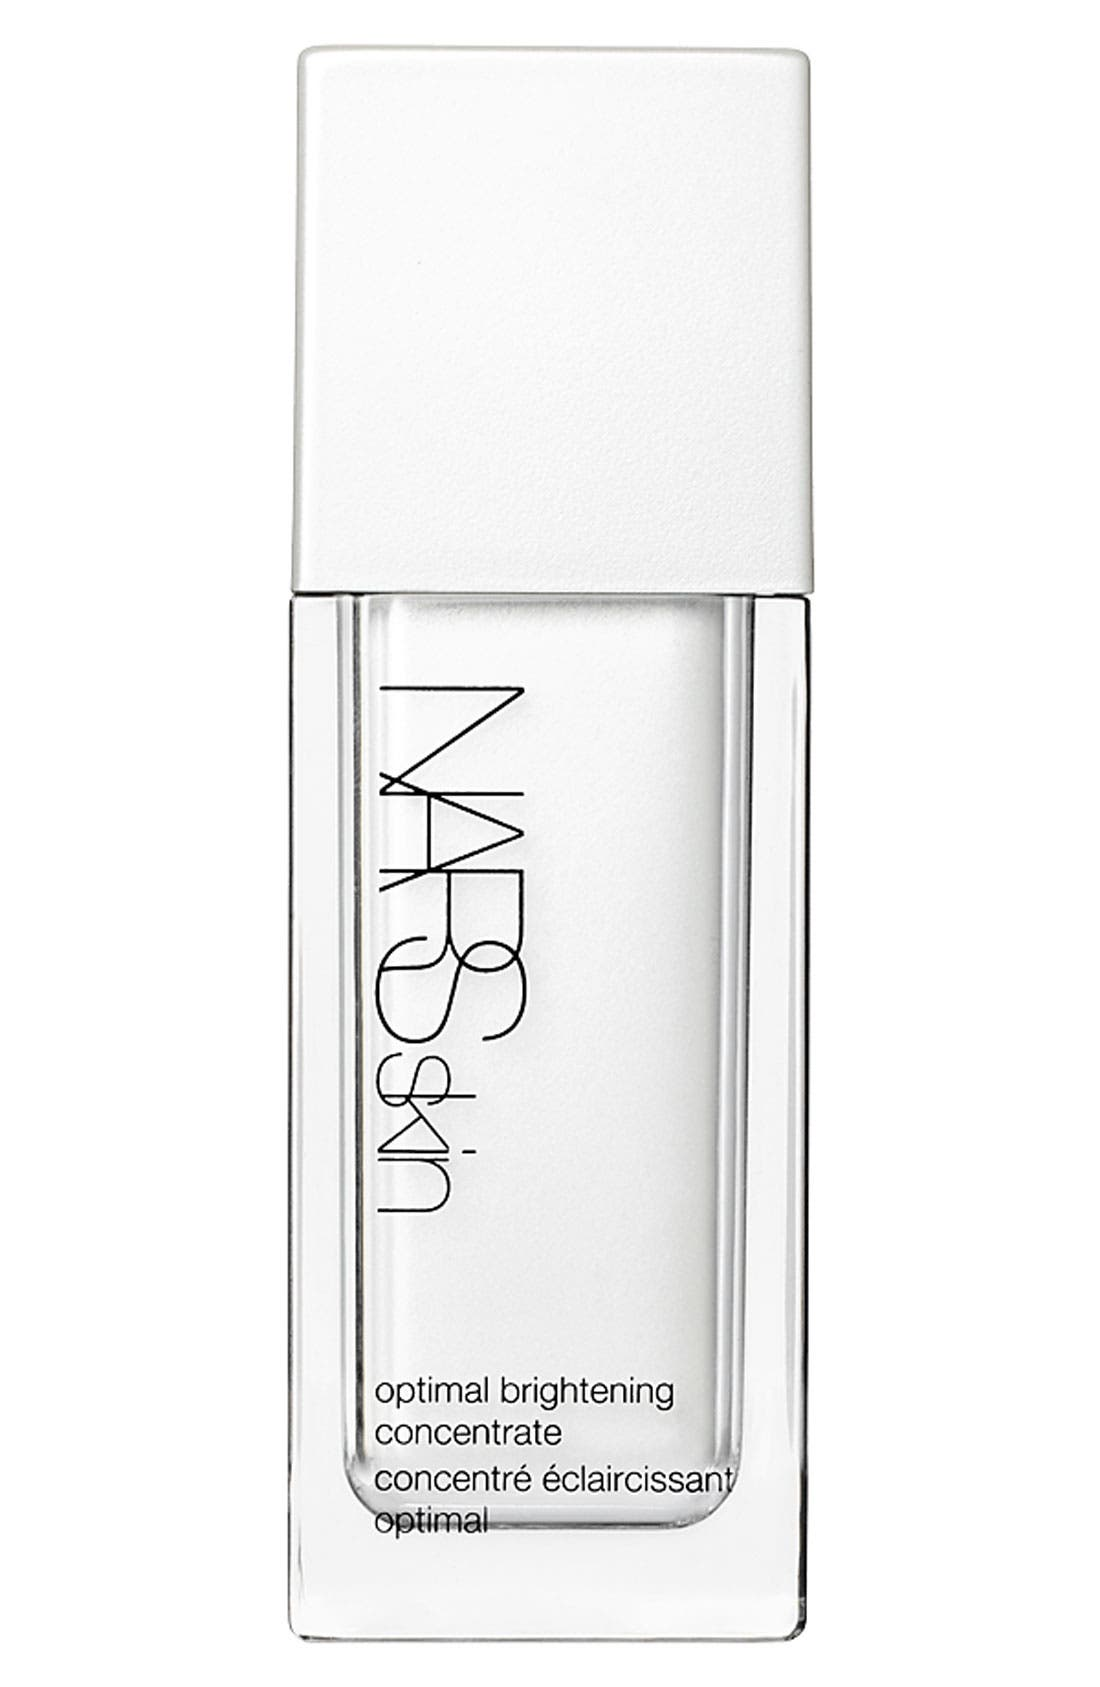 NARS Skin Optimal Brightening Concentrate